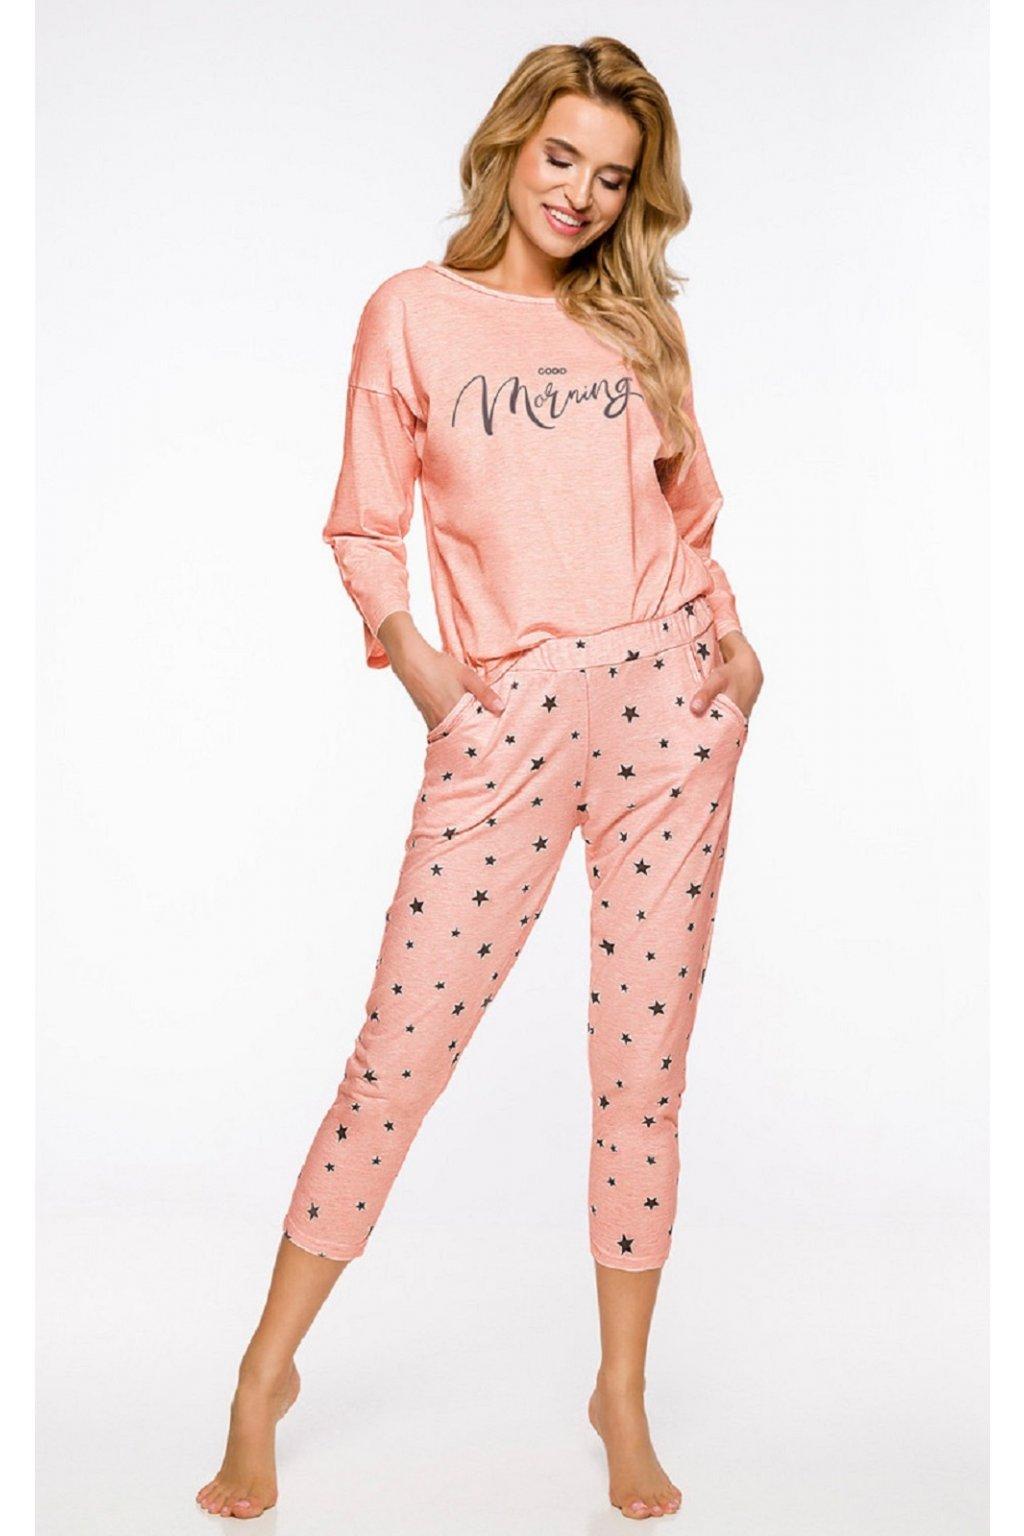 Dámské pyžamo Taro Molly 2314 meruňka